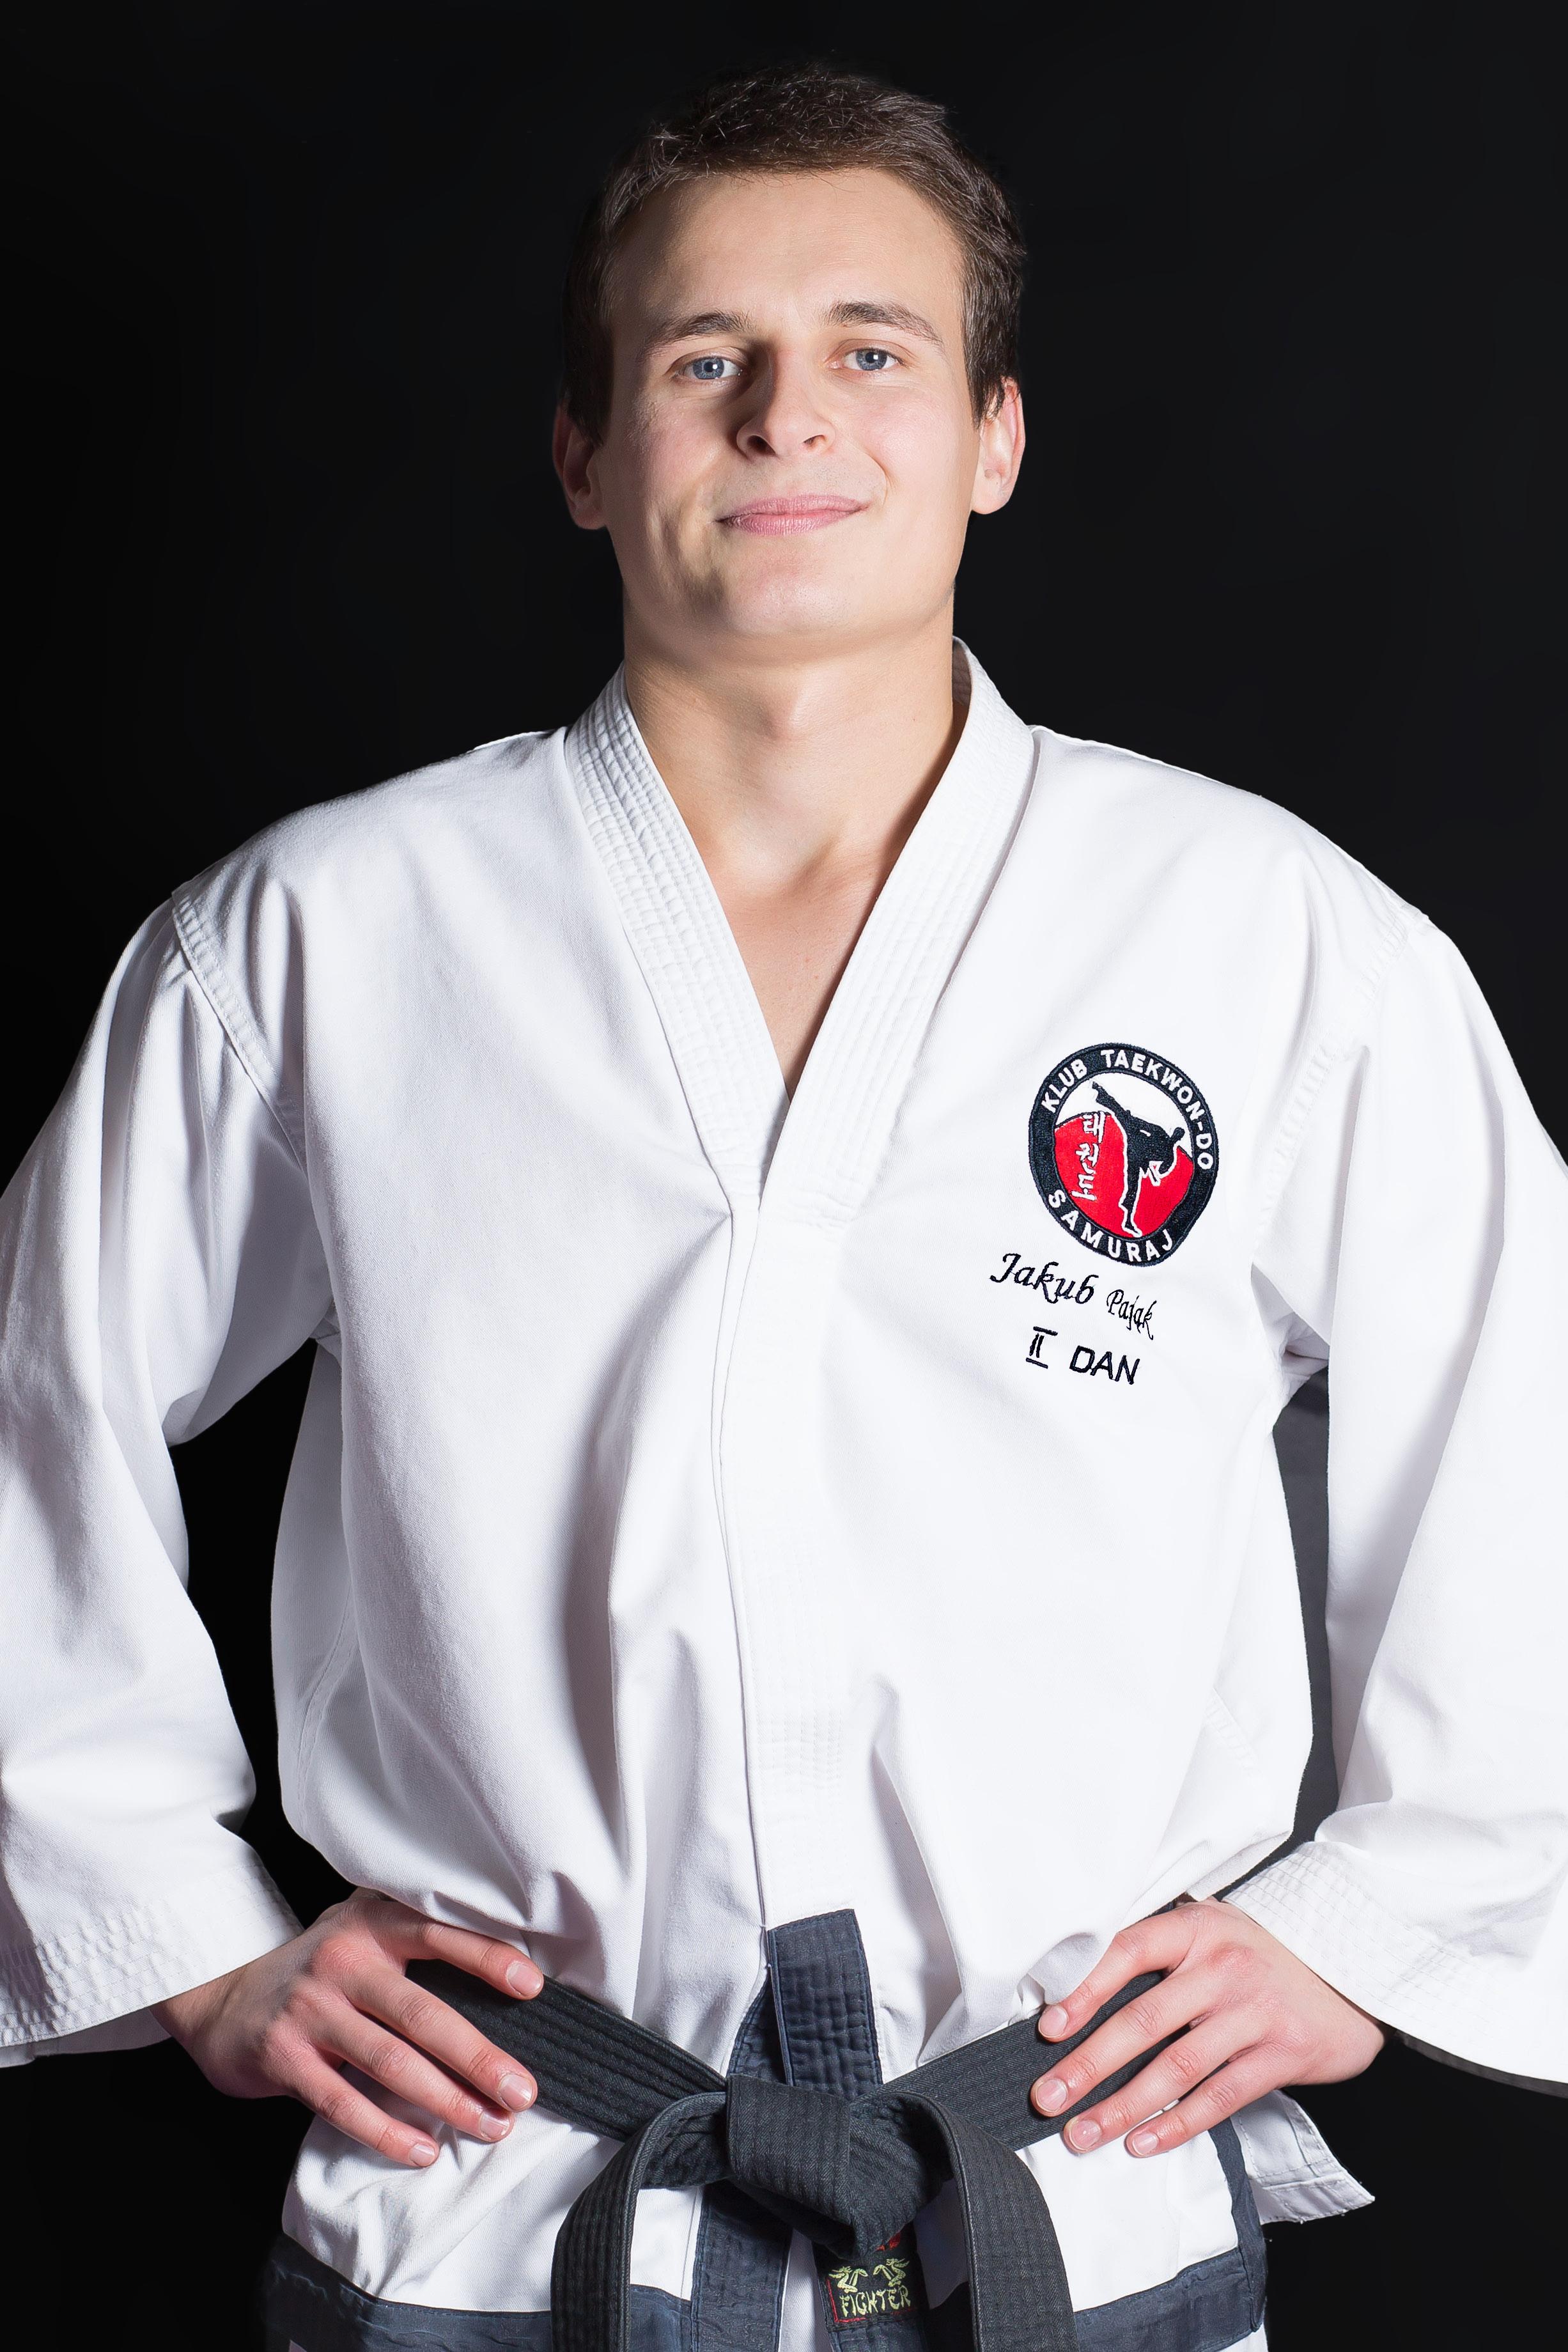 Jakub Pająk